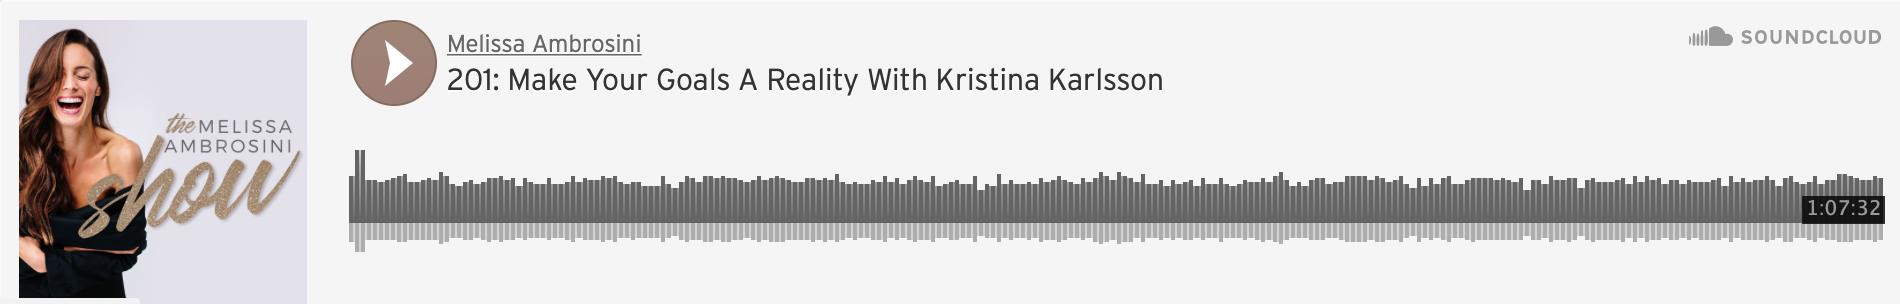 melissa ambrosini: Make your goals a Reality with Kristina karlsson